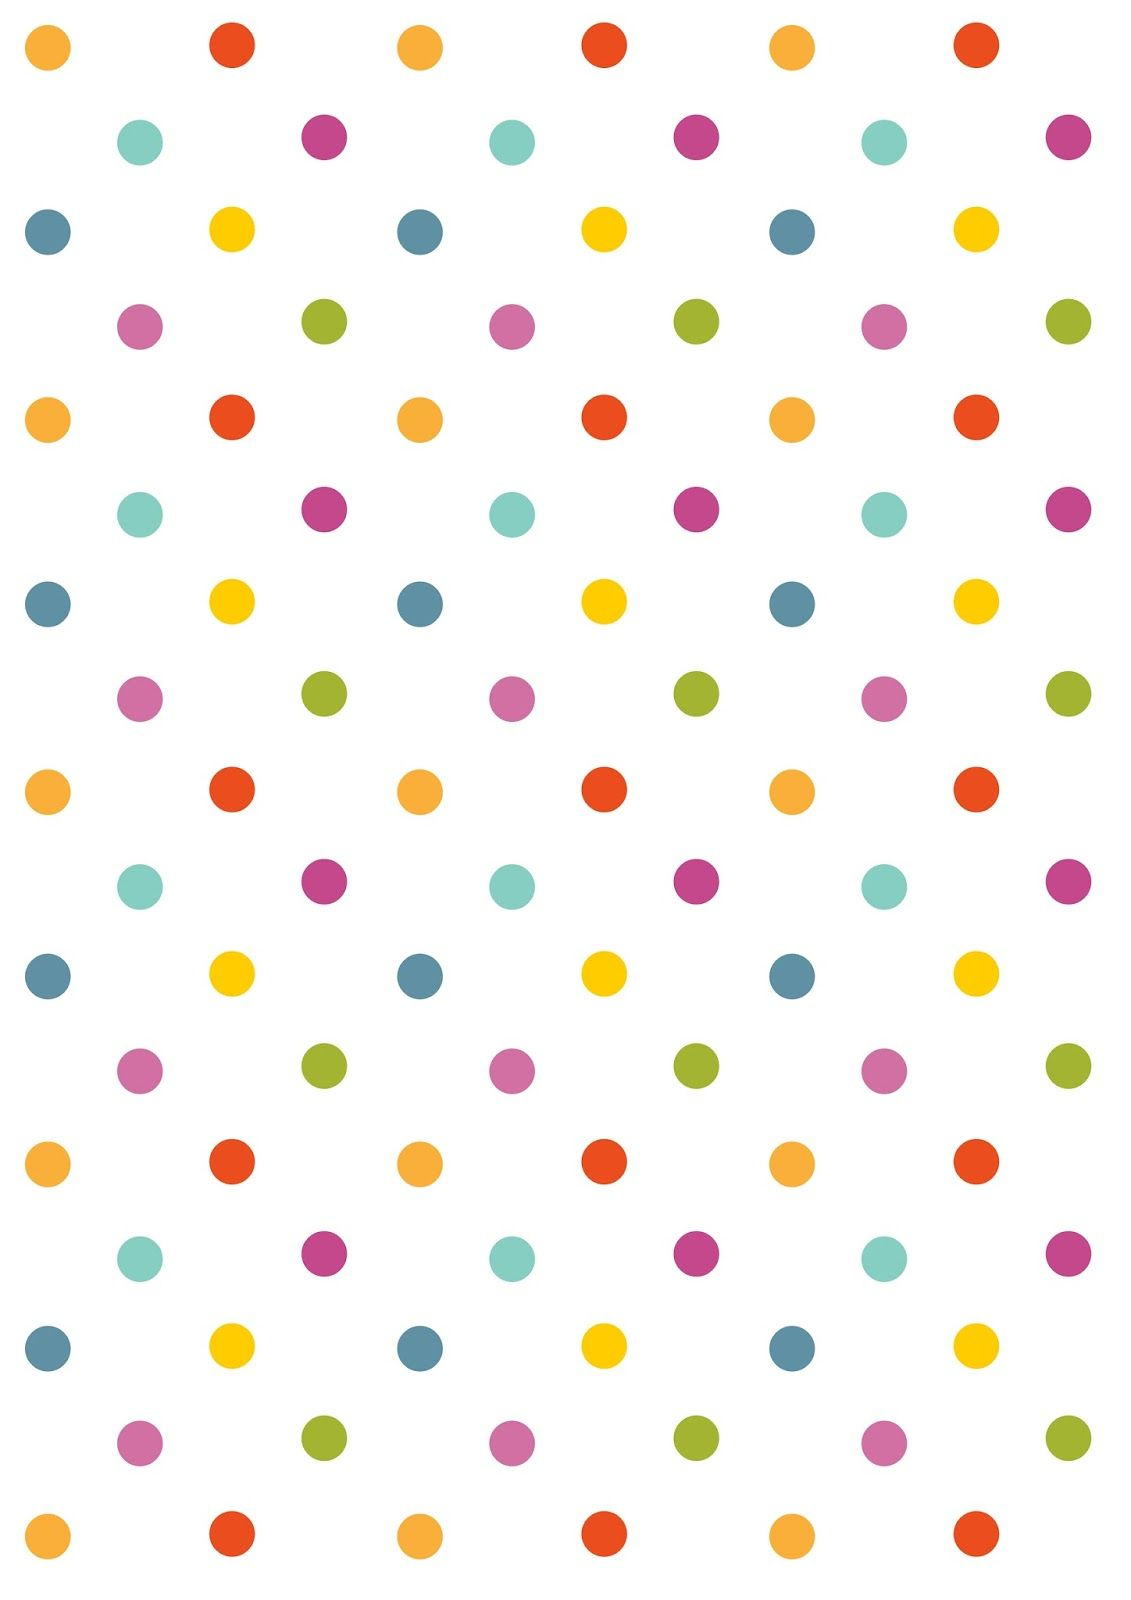 Free Digital Polka Dot Scrapbooking Paper - Ausdruckbares - Free Online Digital Scrapbooking Printable